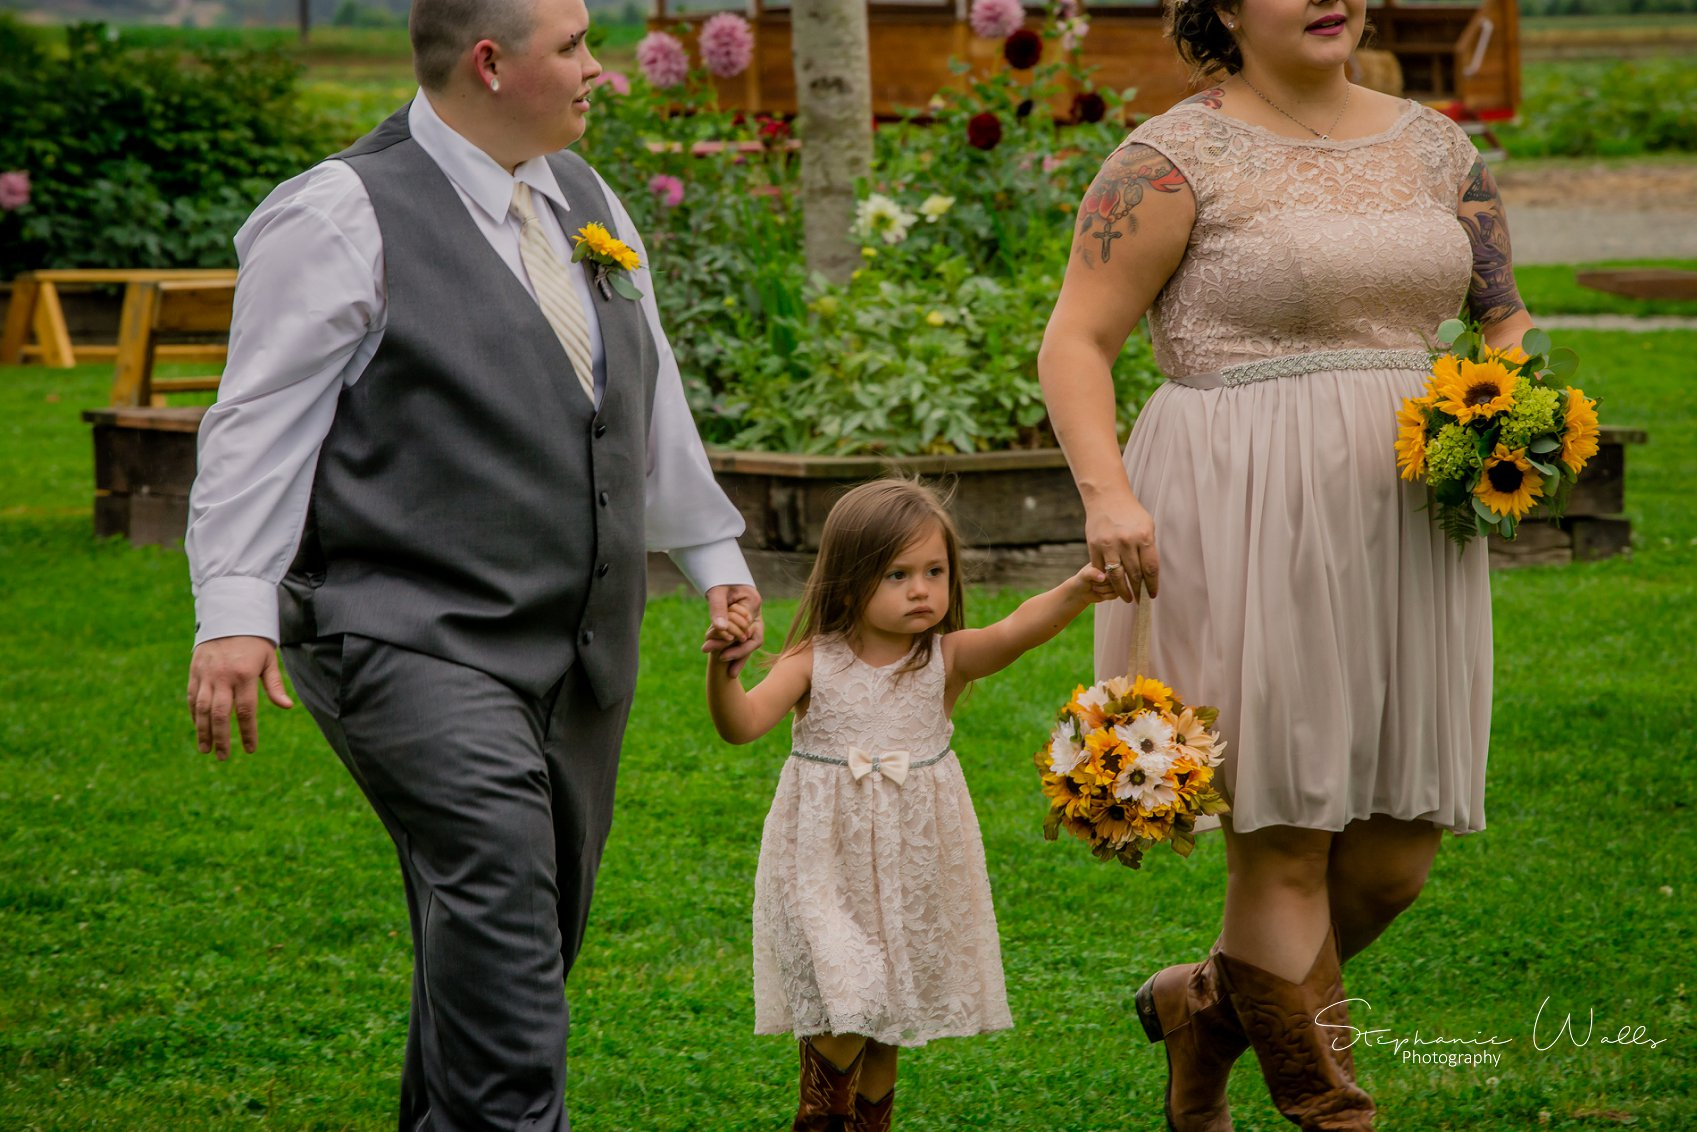 Kimble Wedding 067 Marlena & Allans | Snohomish Red Barn Events (Stocker Farms) | Snohomish, Wa Wedding Photographer